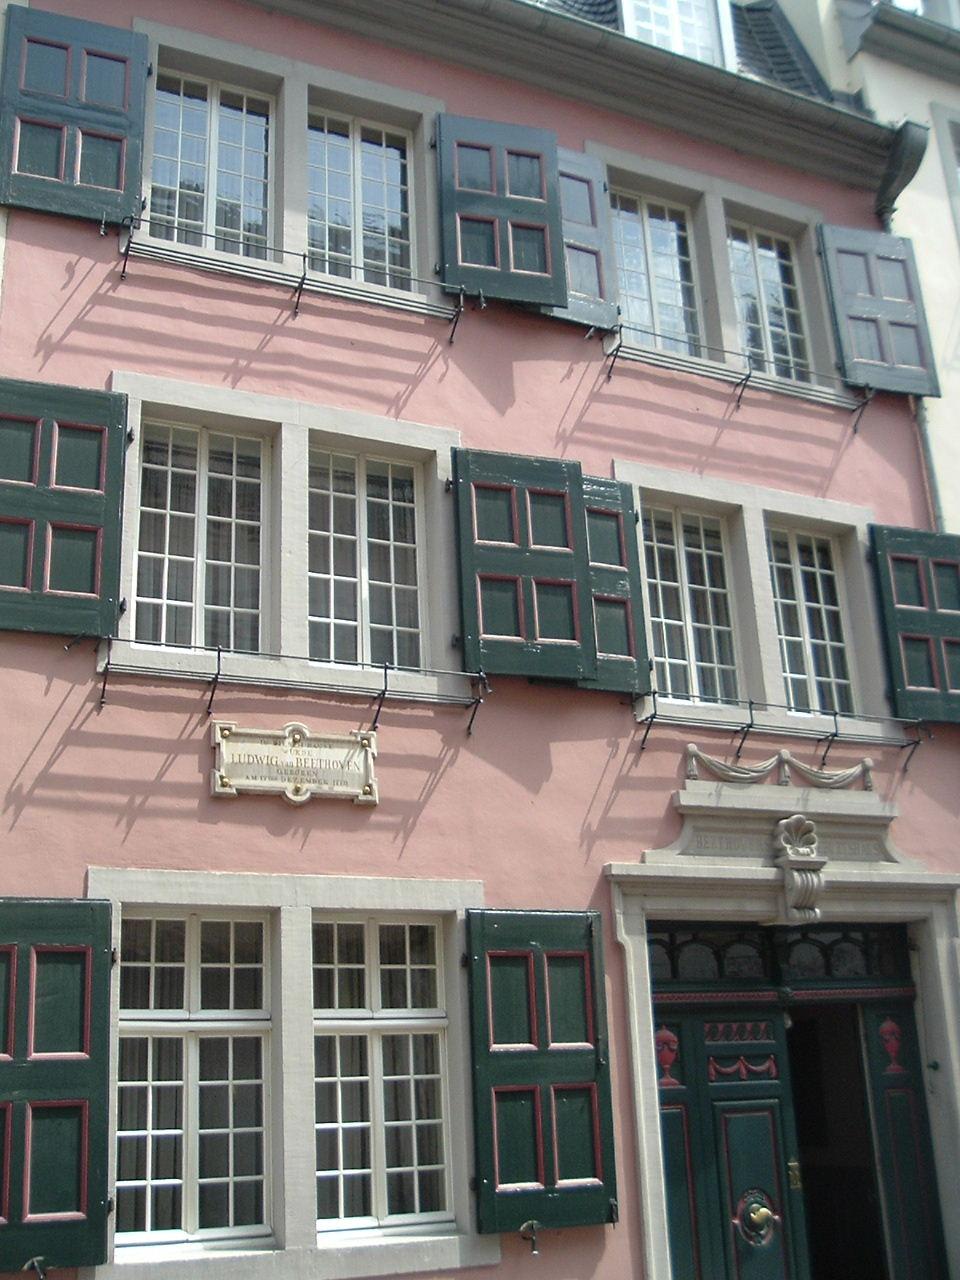 Casa di Beethoven a Bonn, come arrivare